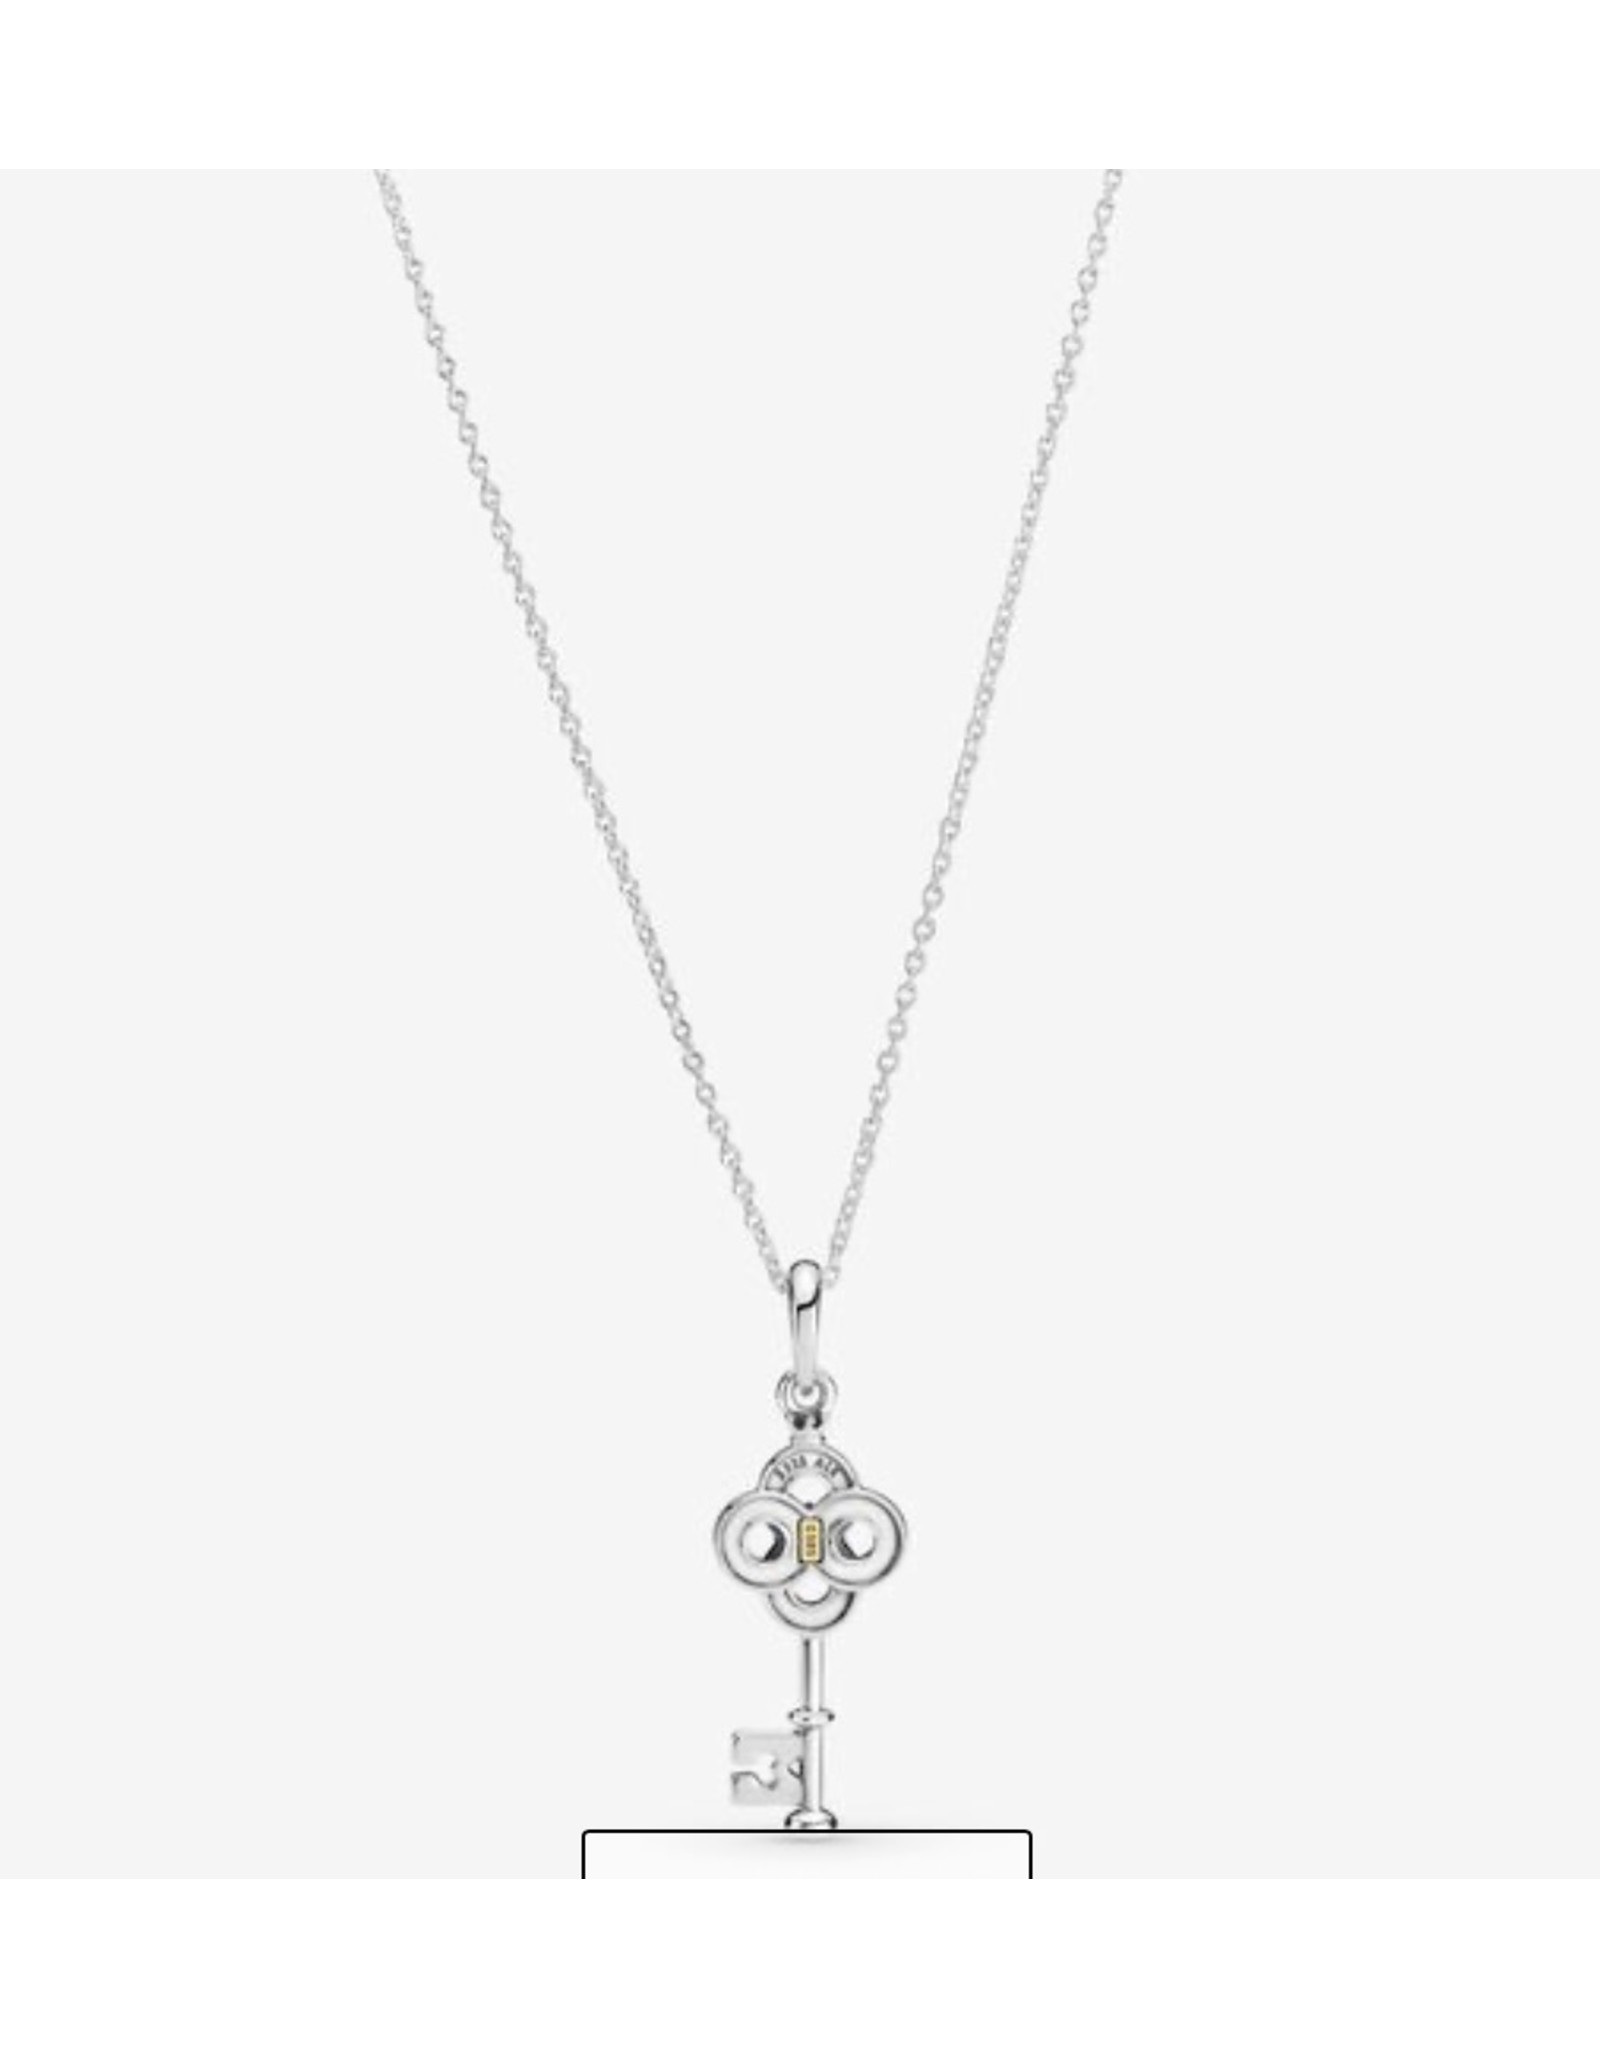 Pandora Pandora Necklace,399339C01-70, Two-Tone Key & Flower, 14K Gold